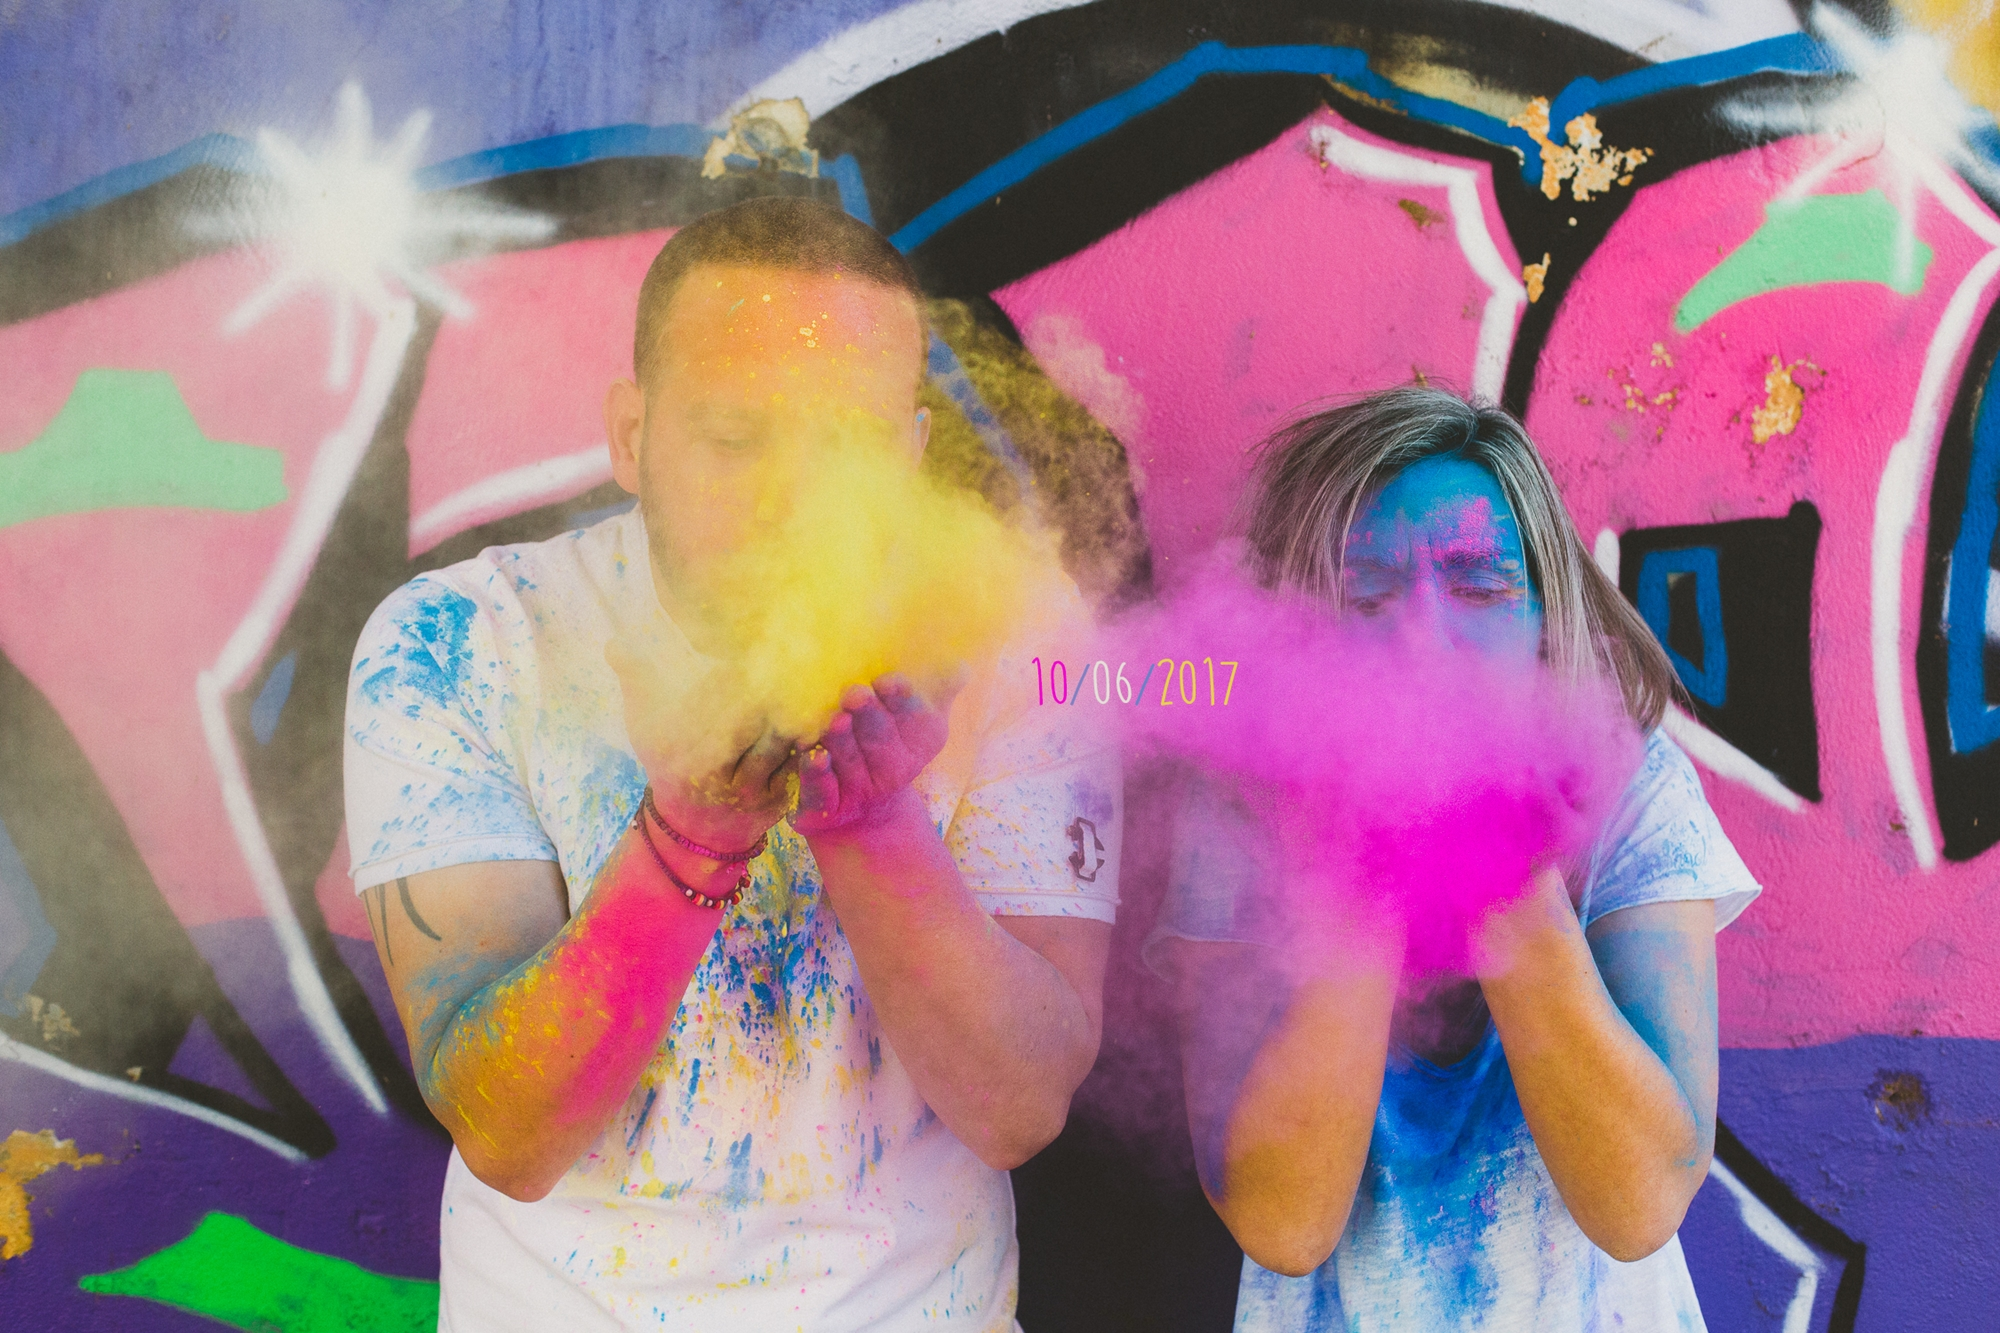 Pre wedding engagement φωτογράφιση με χρώματα και μπογιές Labrini Sotiriou